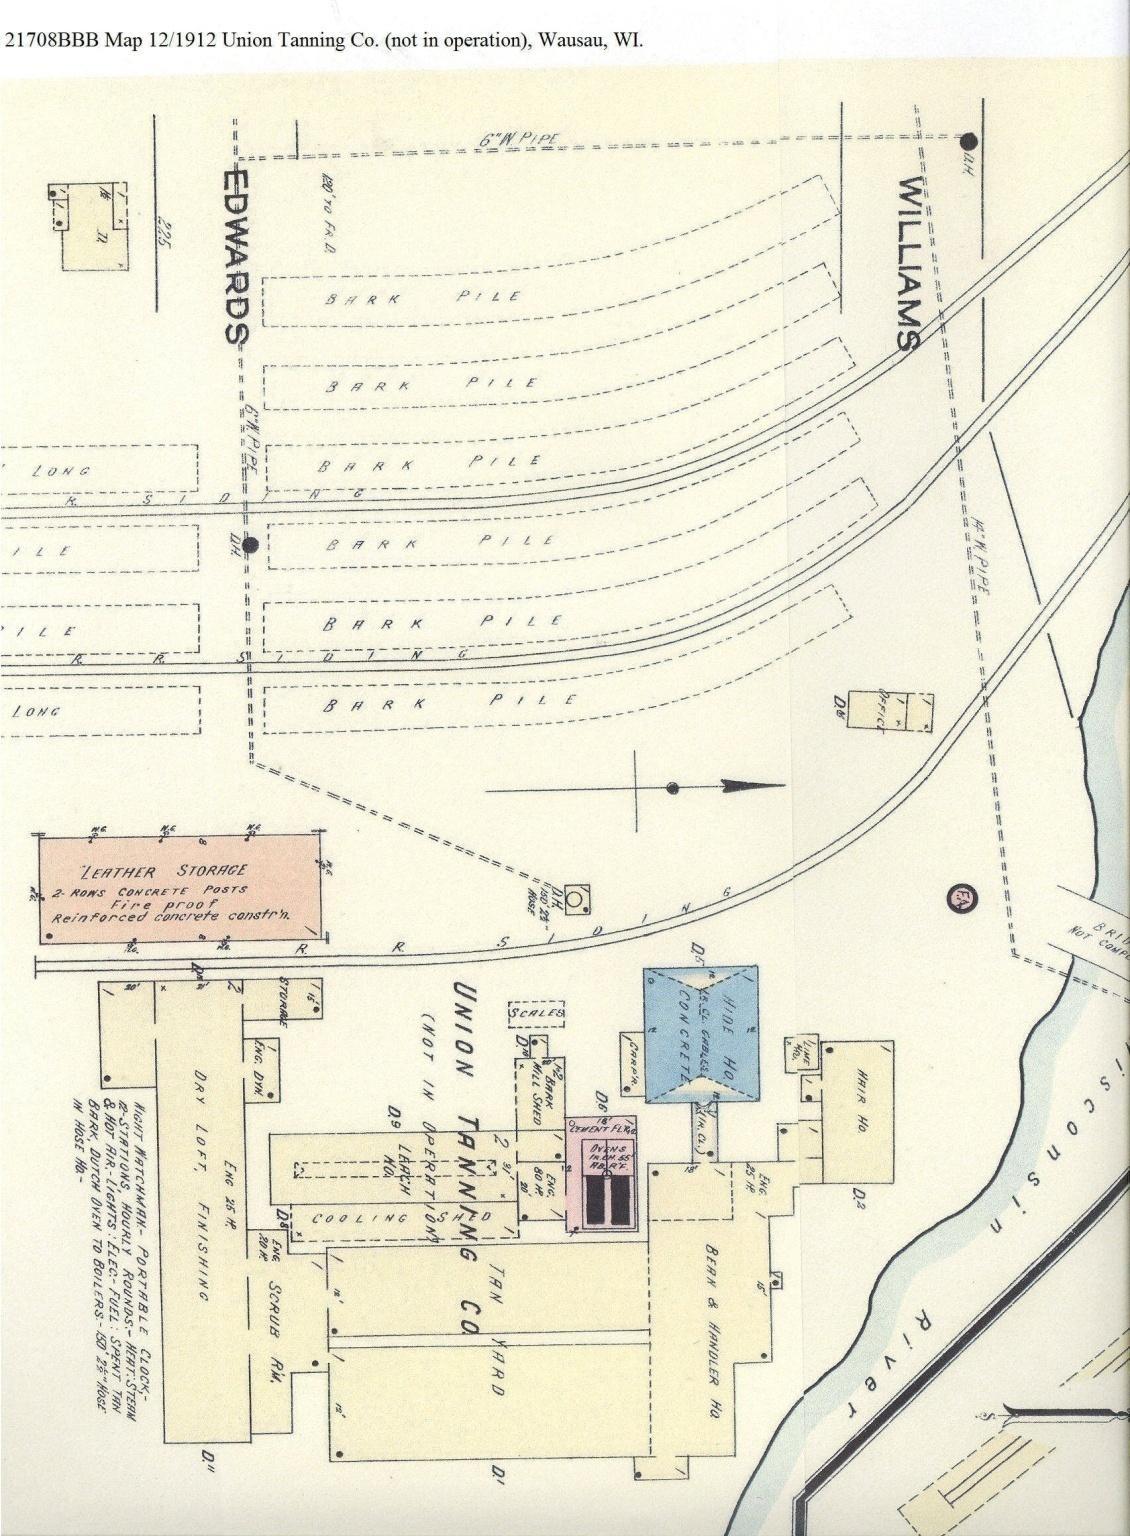 C:\Users\Robert P. Rusch\Desktop\II. RLHSoc\Documents & Photos-Scanned\Rib Lake History 21700-21799\21708BBB Map 12-1912 Union Tanning Co, Wausau, WI.jpg